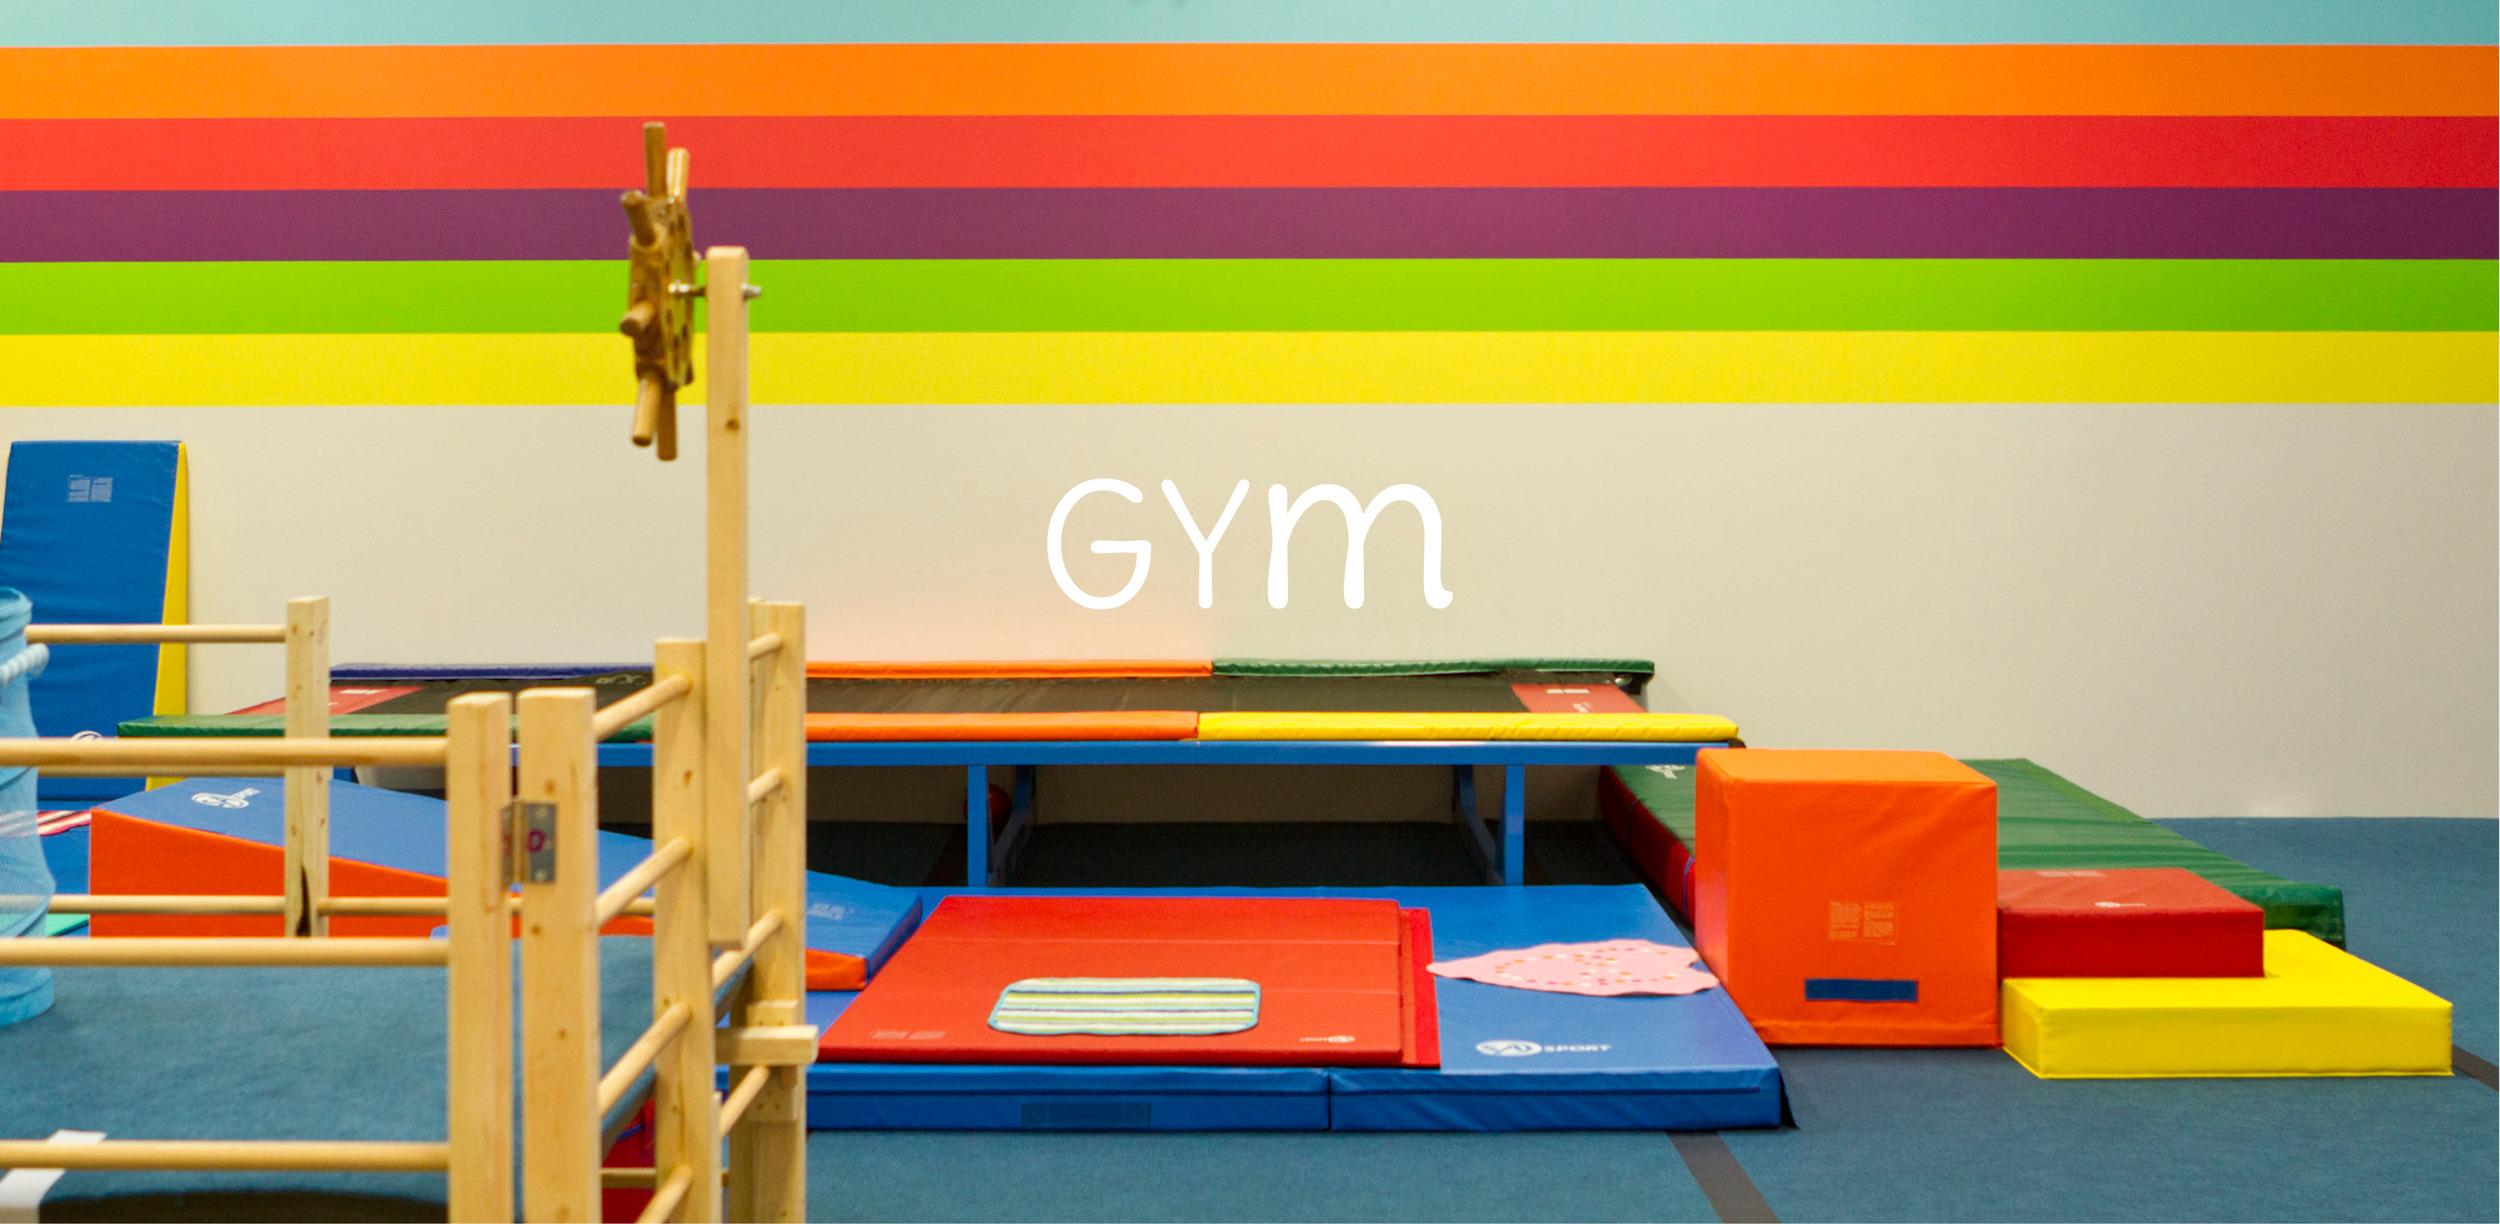 NV_slideshow_gym2.jpg